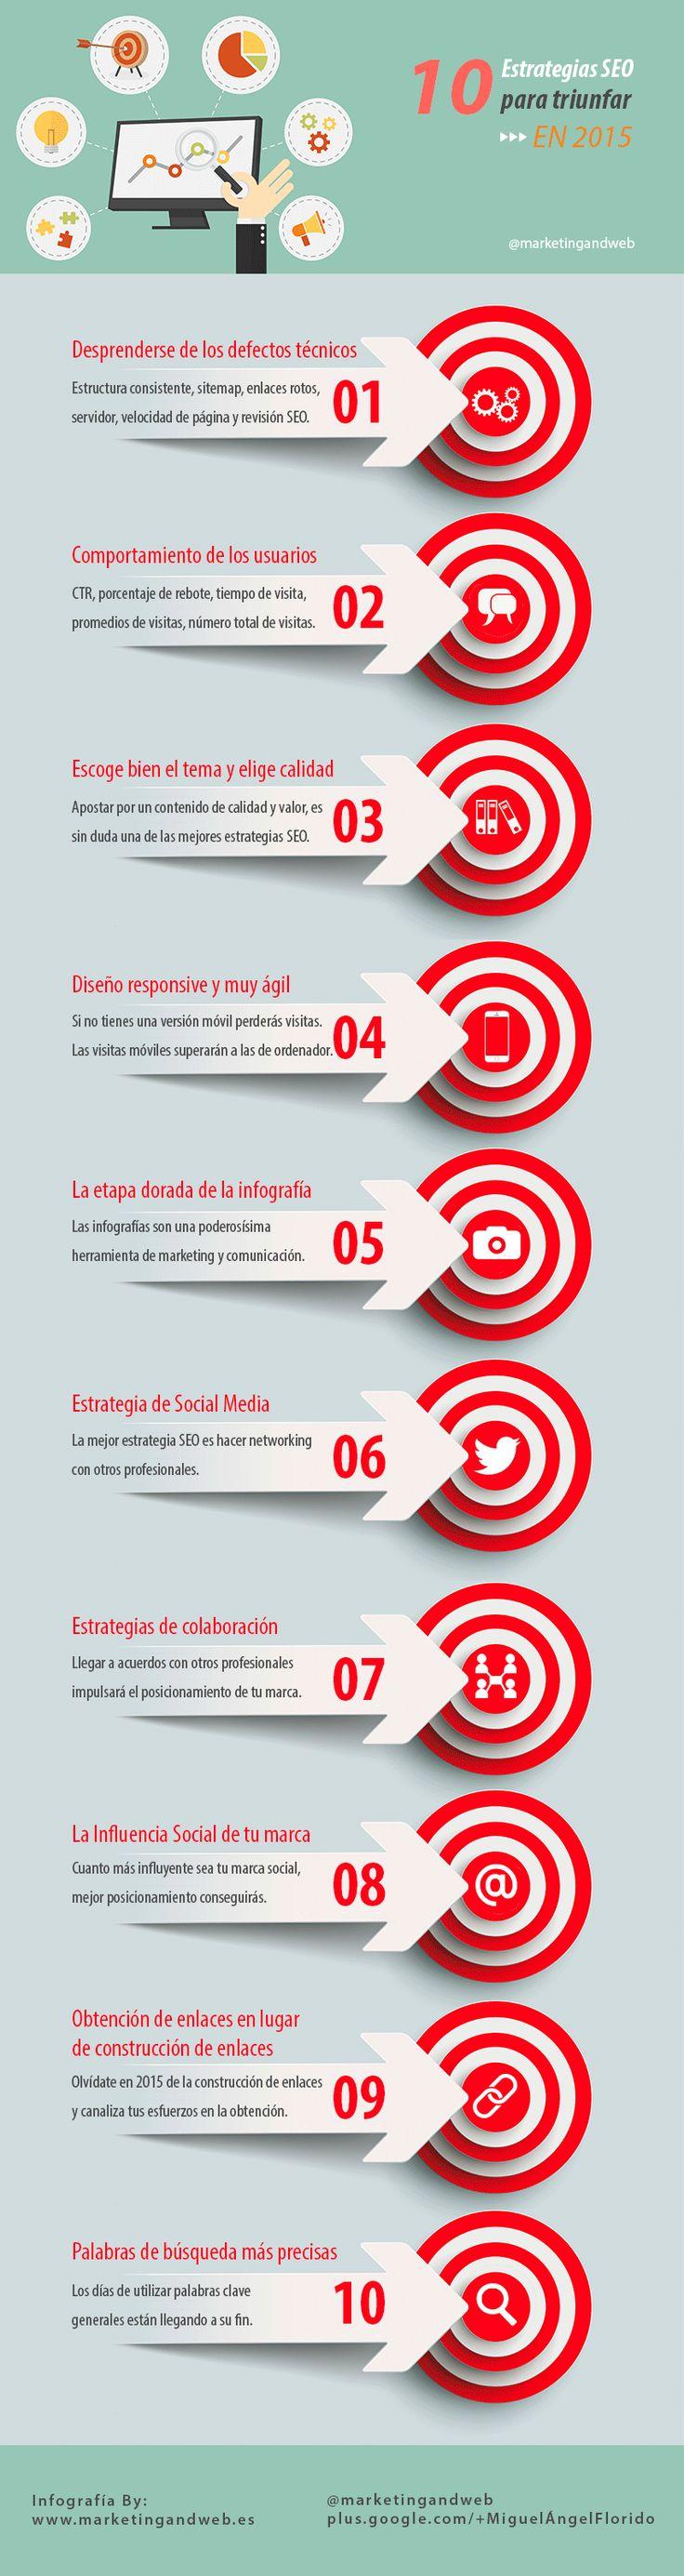 #Infografia 10 estrategias SEO que te harán triunfar en 2015 via @marketingandweb